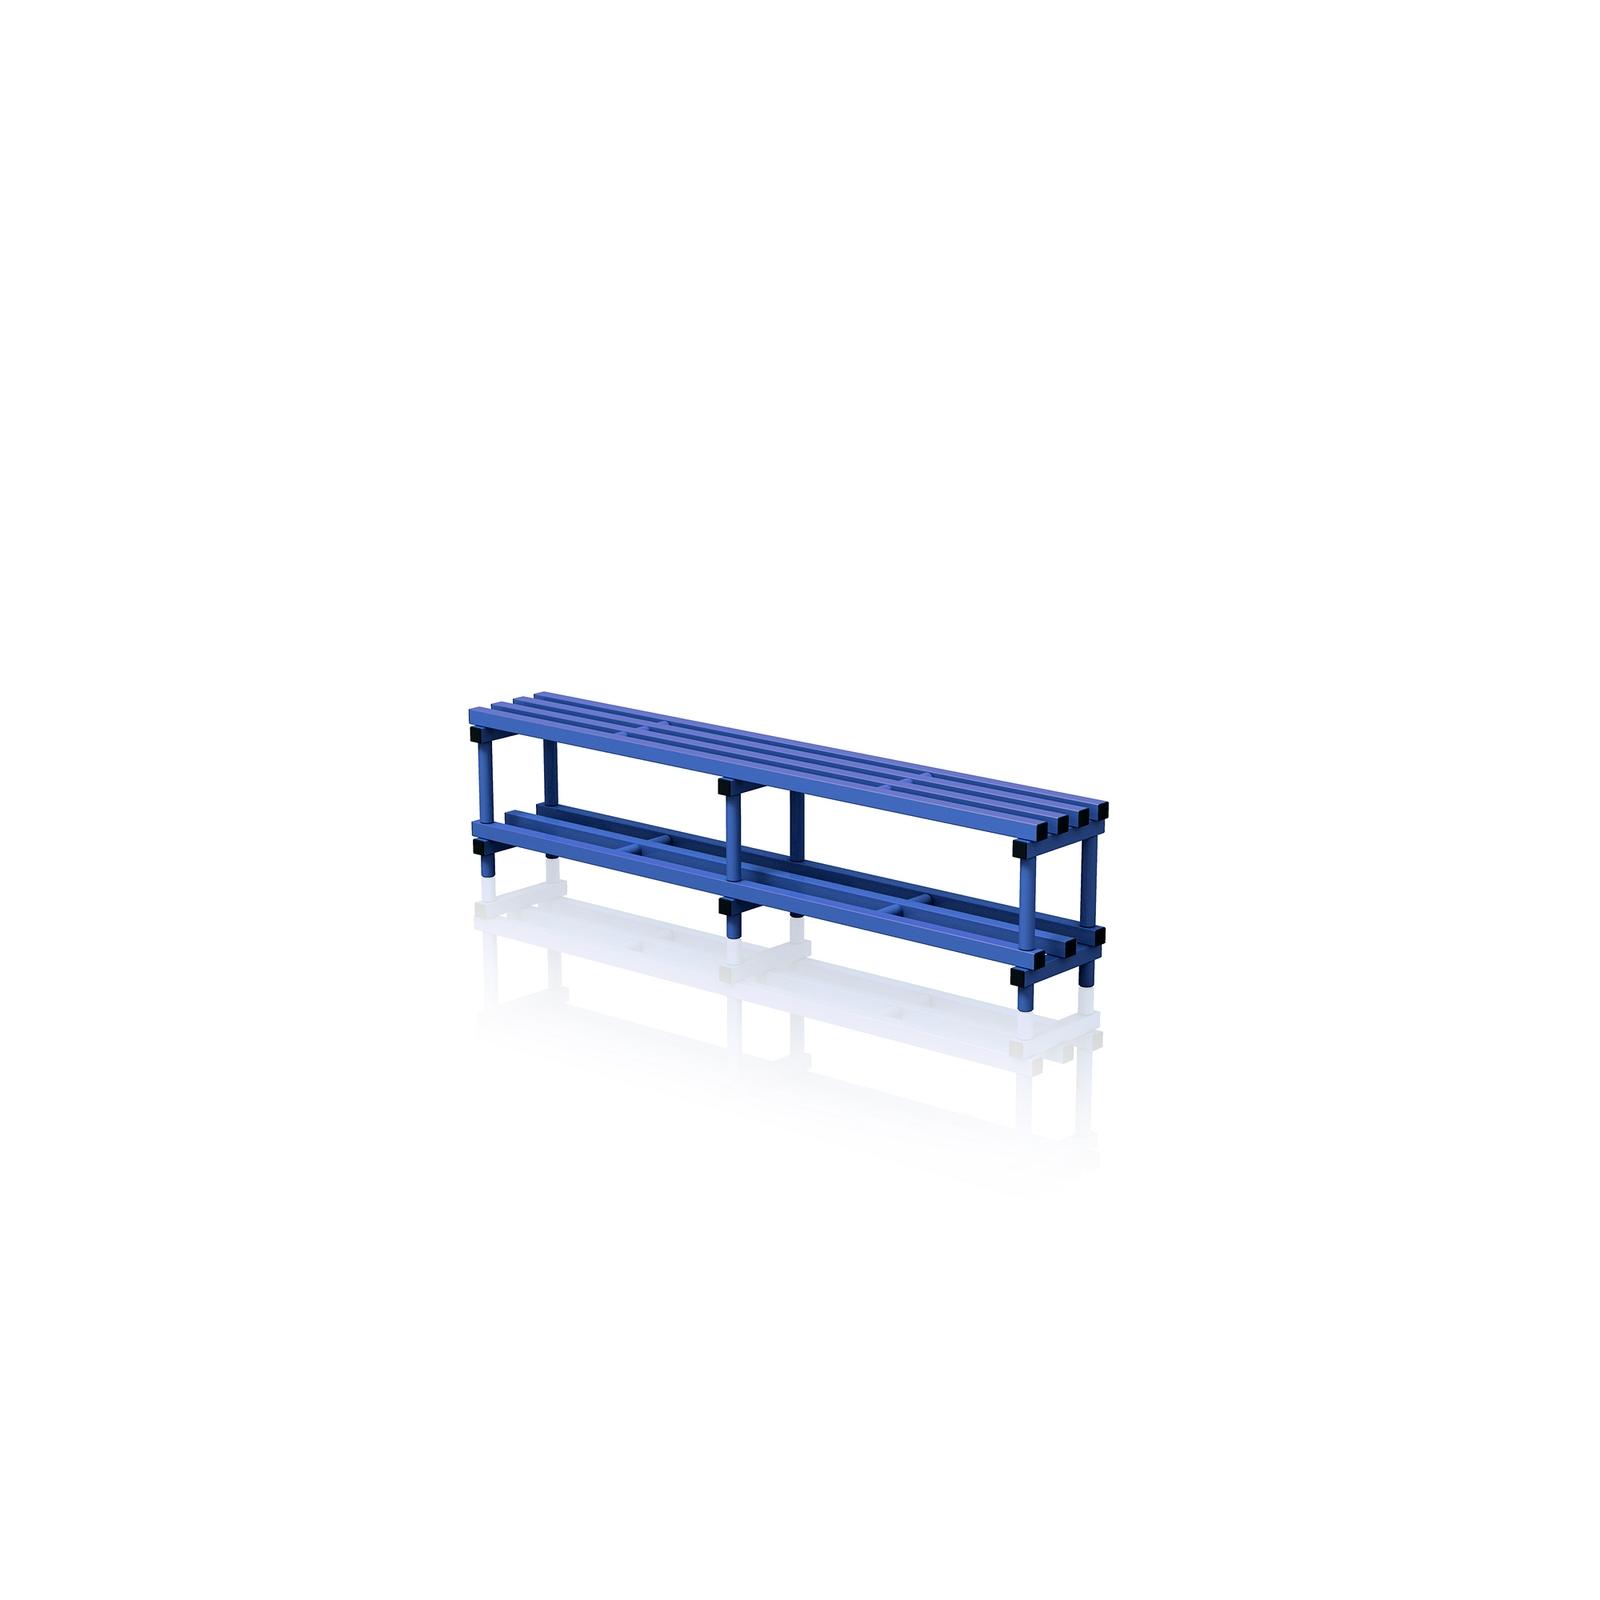 Bench With Bottom Shelf Large Blue